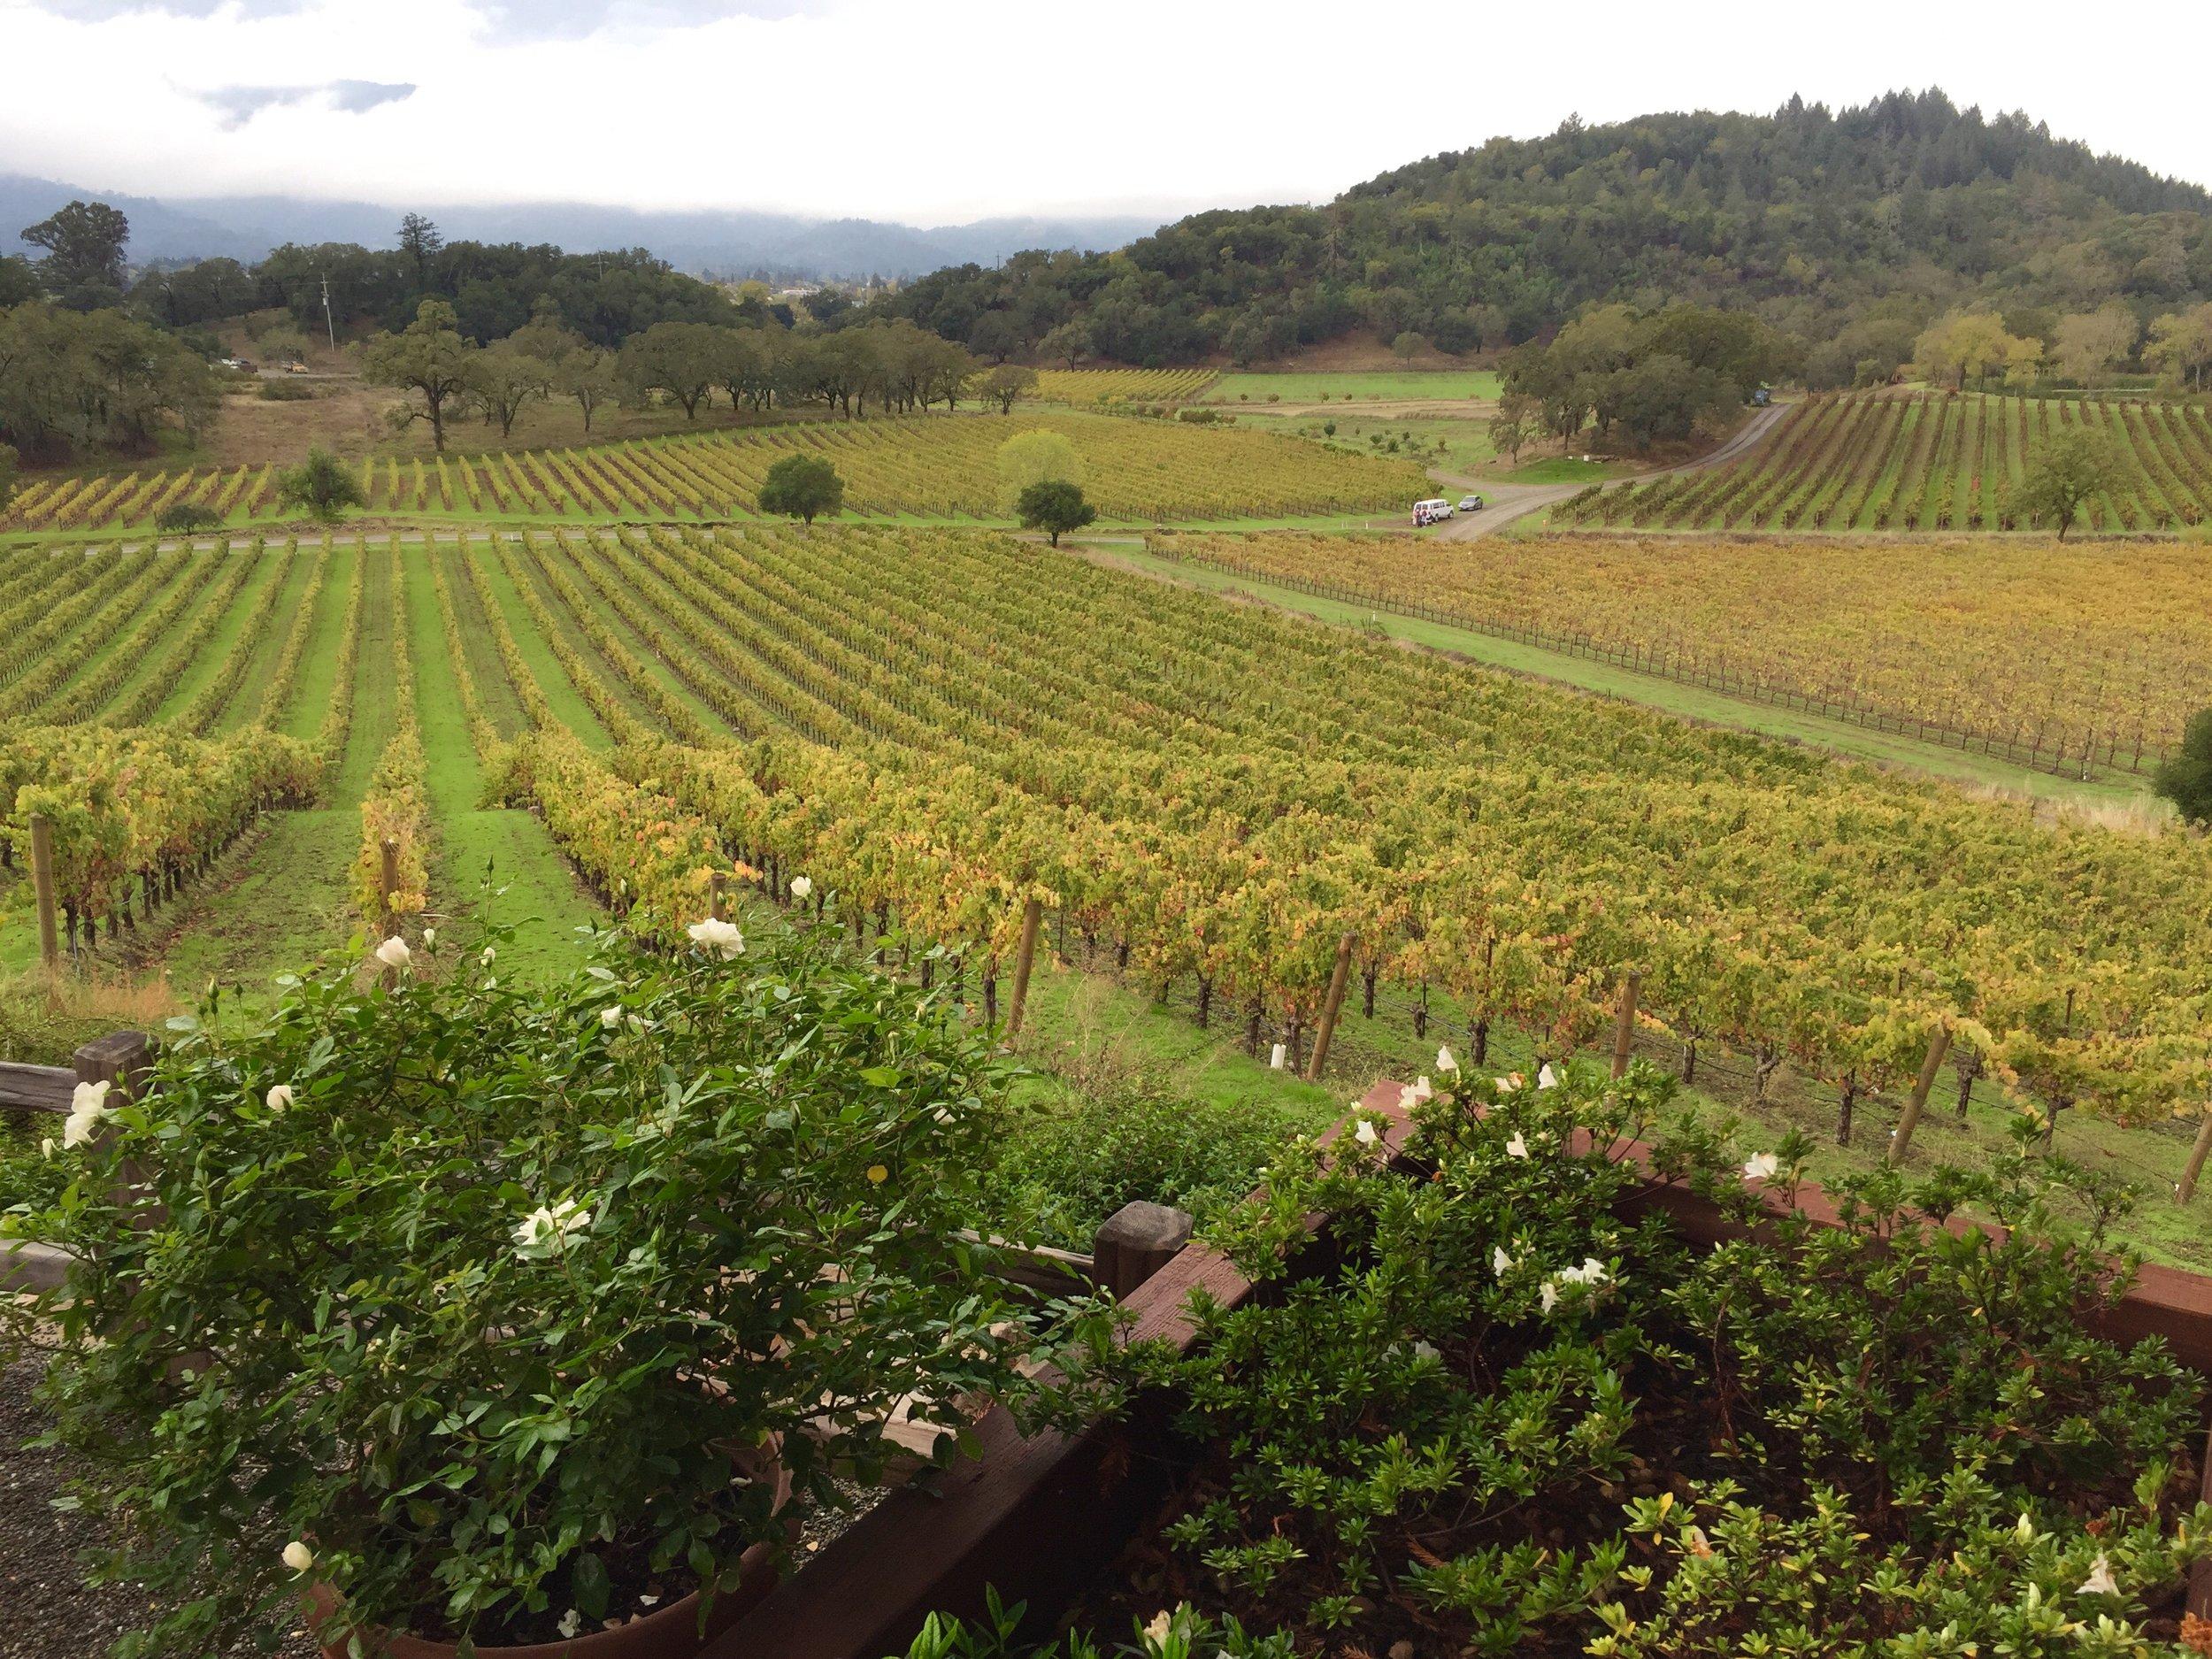 Spectacular views at Joseph Phelps Winery